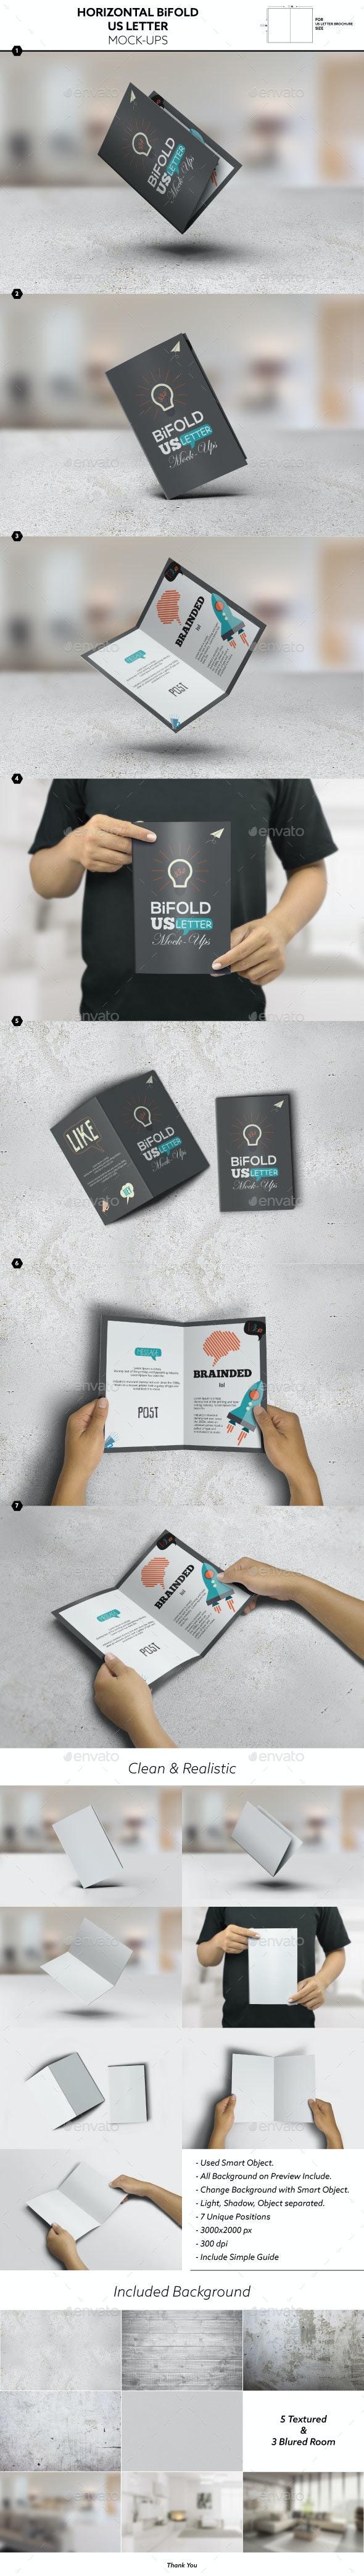 Horizontal Bifold Brochure US Letter Mockups - Brochures Print